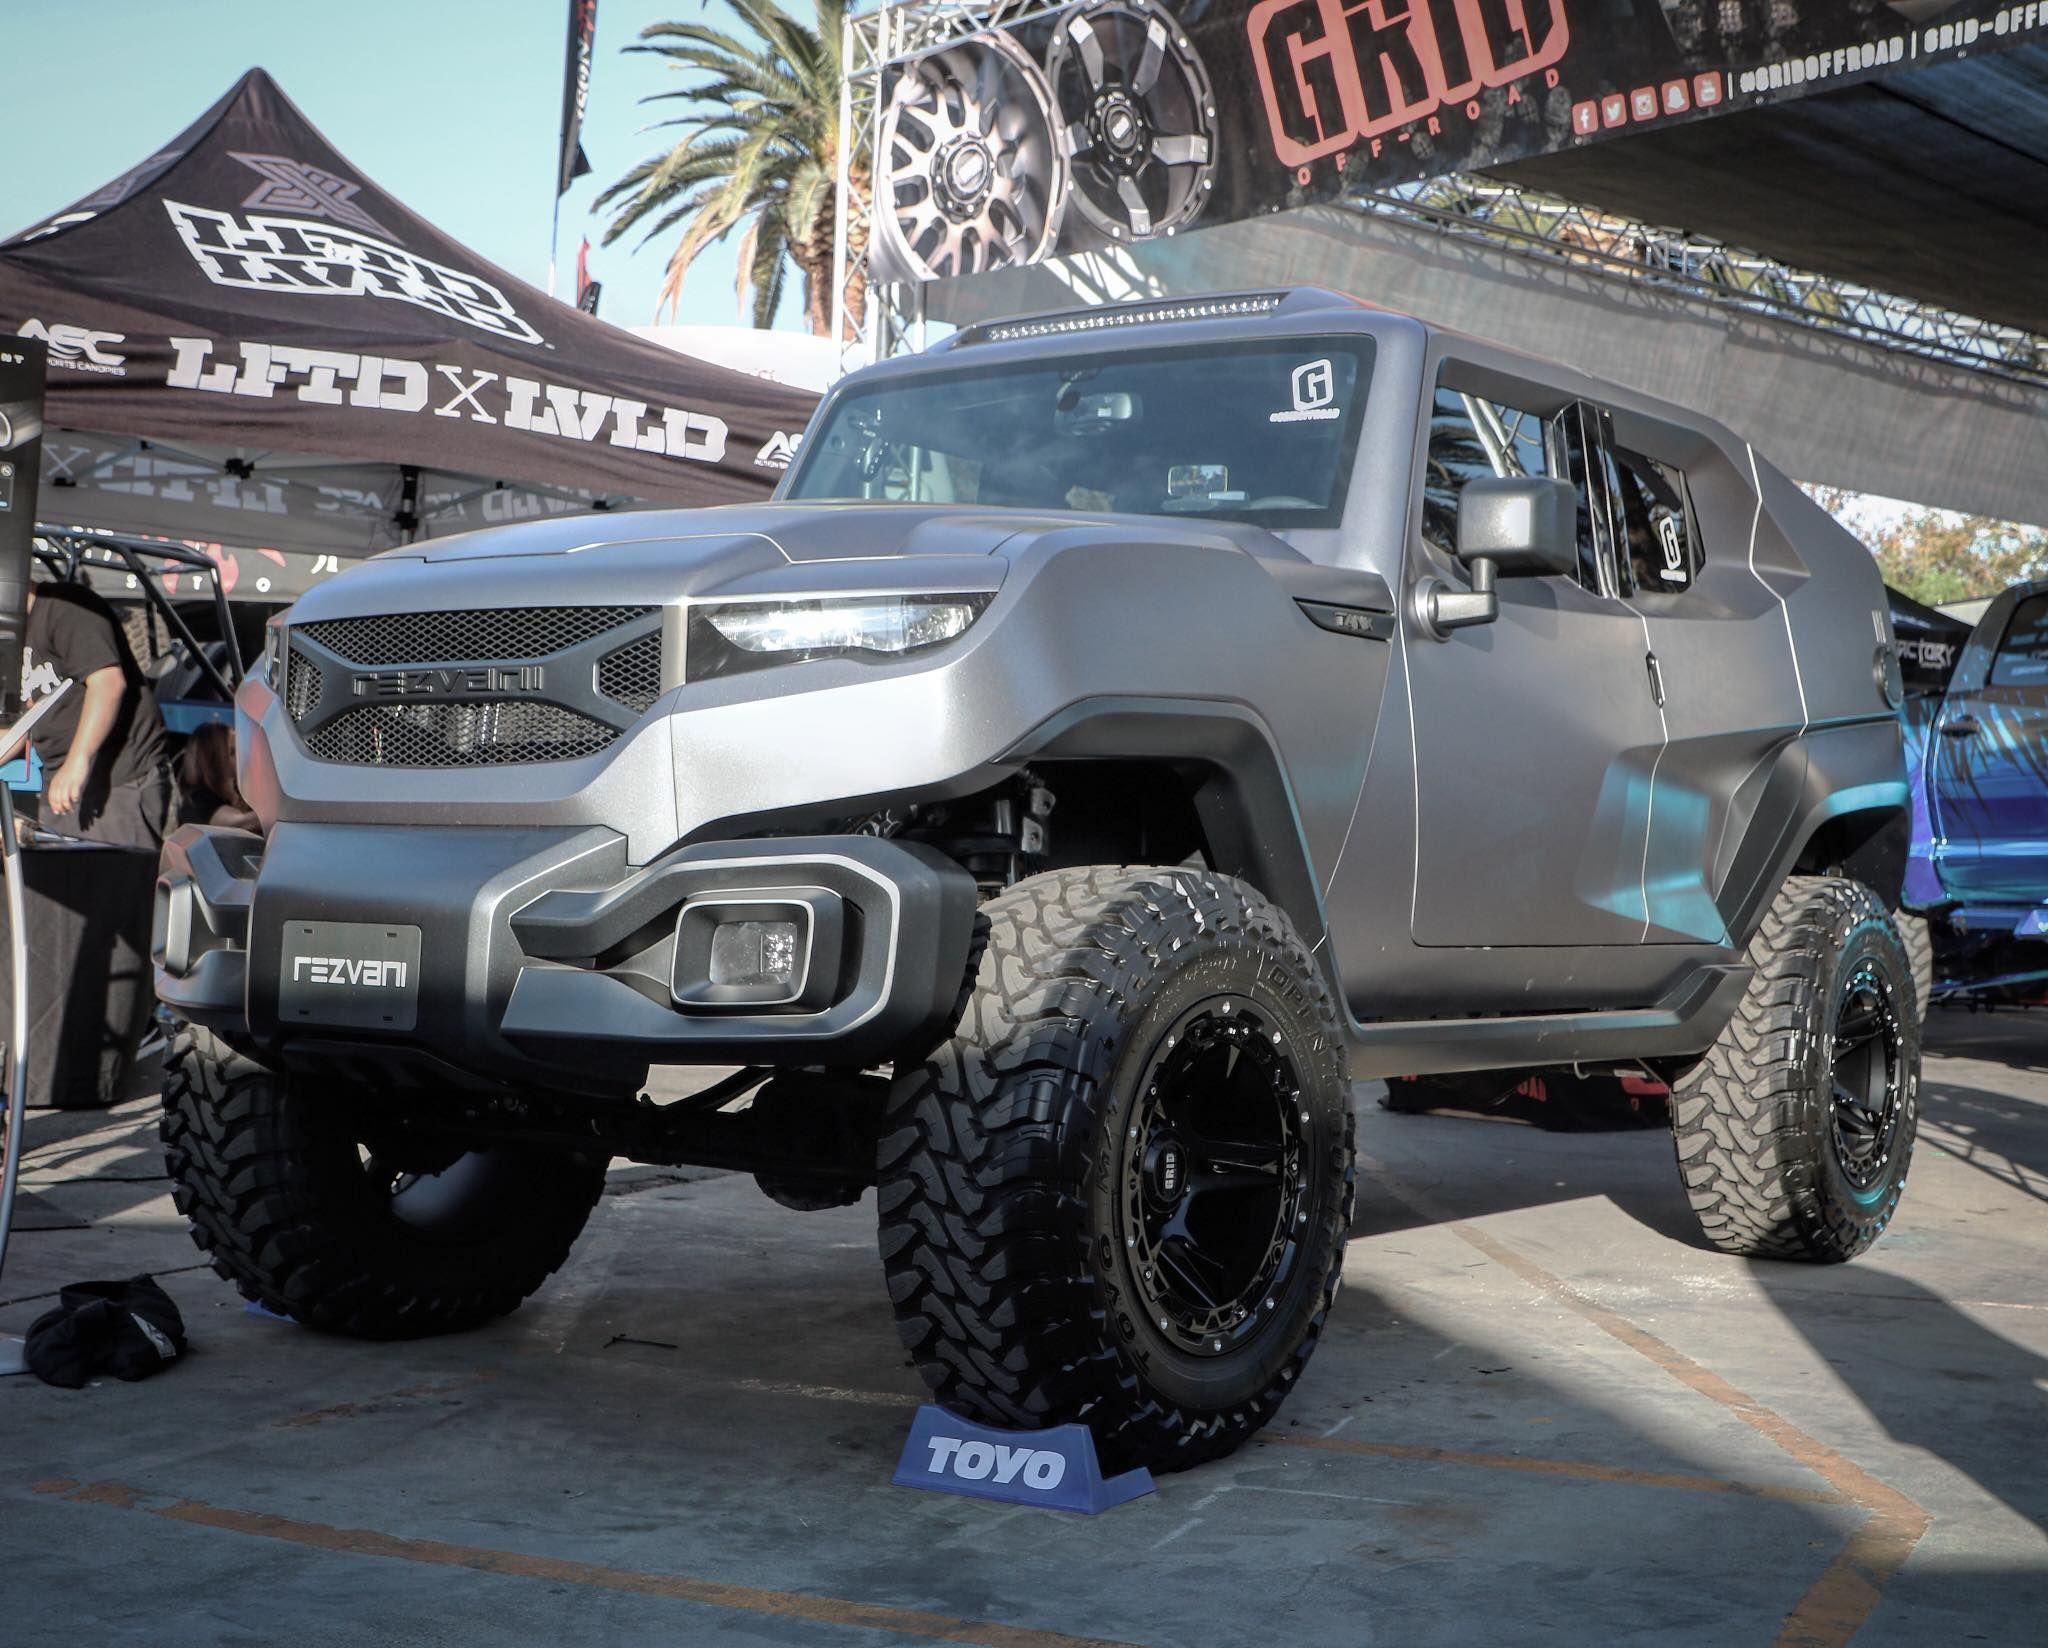 Rezvani Motors TANK Concept Build at the f Road Expo in Pomona Ca